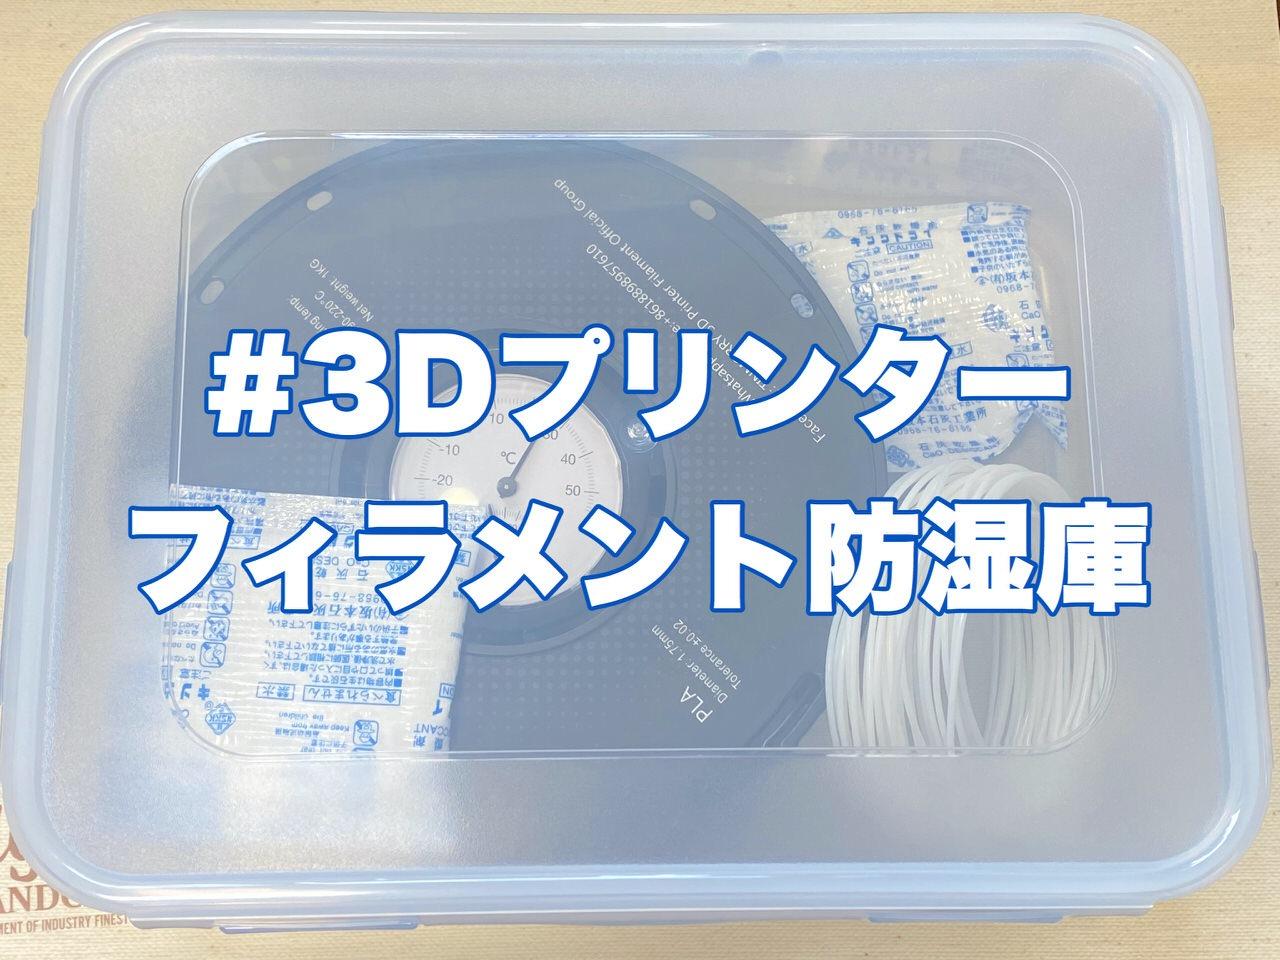 【3Dプリンター始めました】100円ショップの密封容器とハクバの乾燥剤でフィラメント用の防湿庫を作る